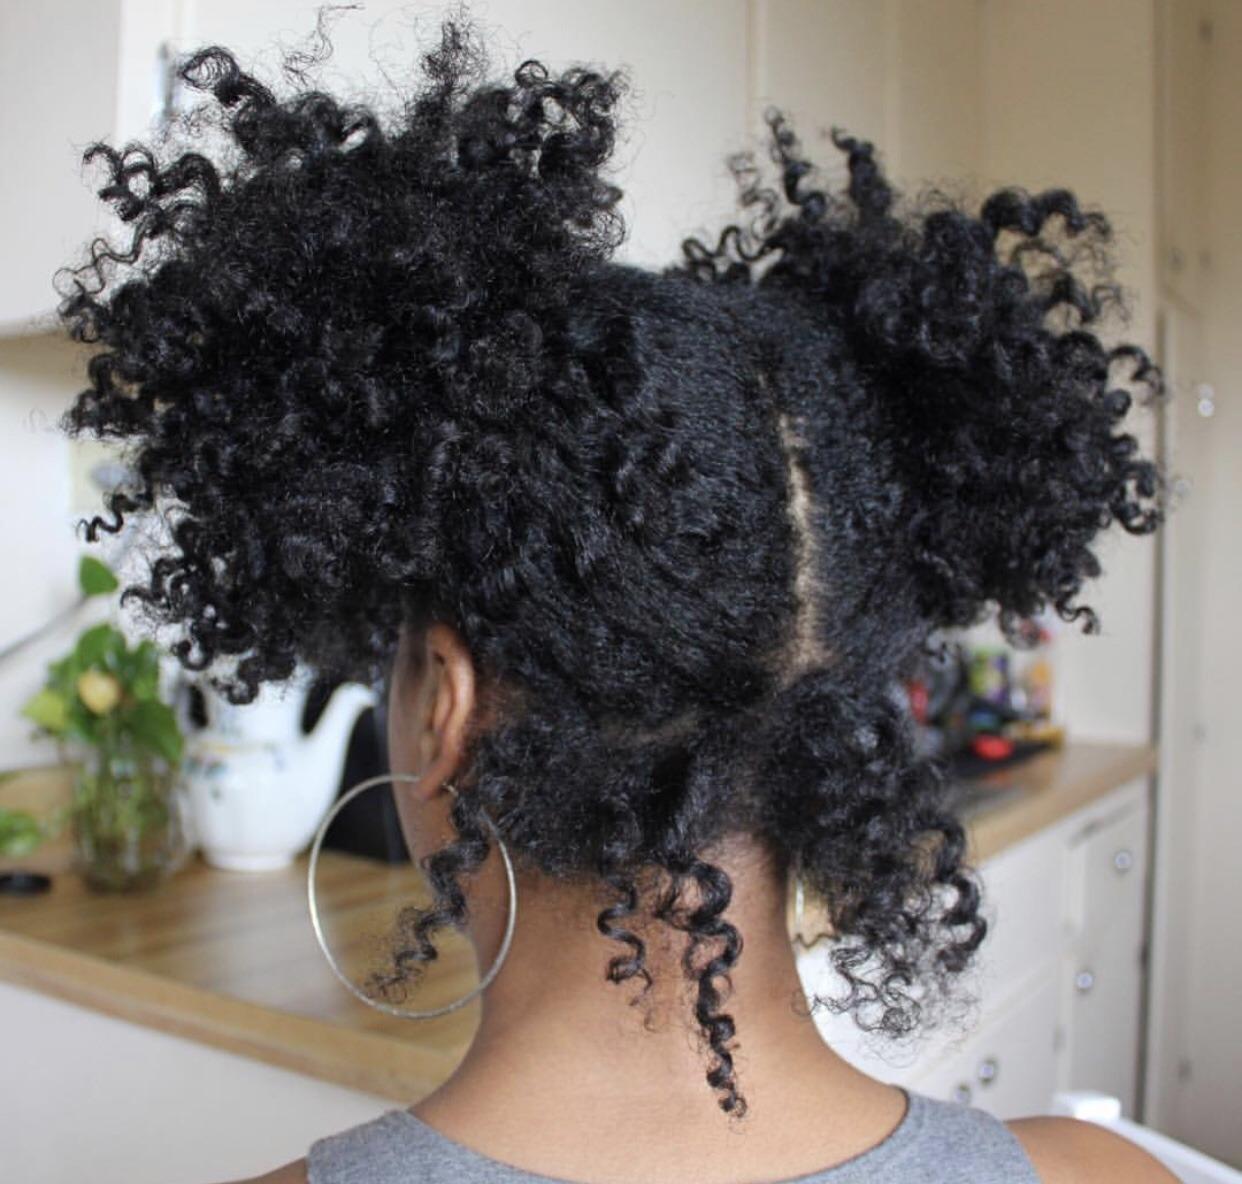 hairstyle and natural hair image